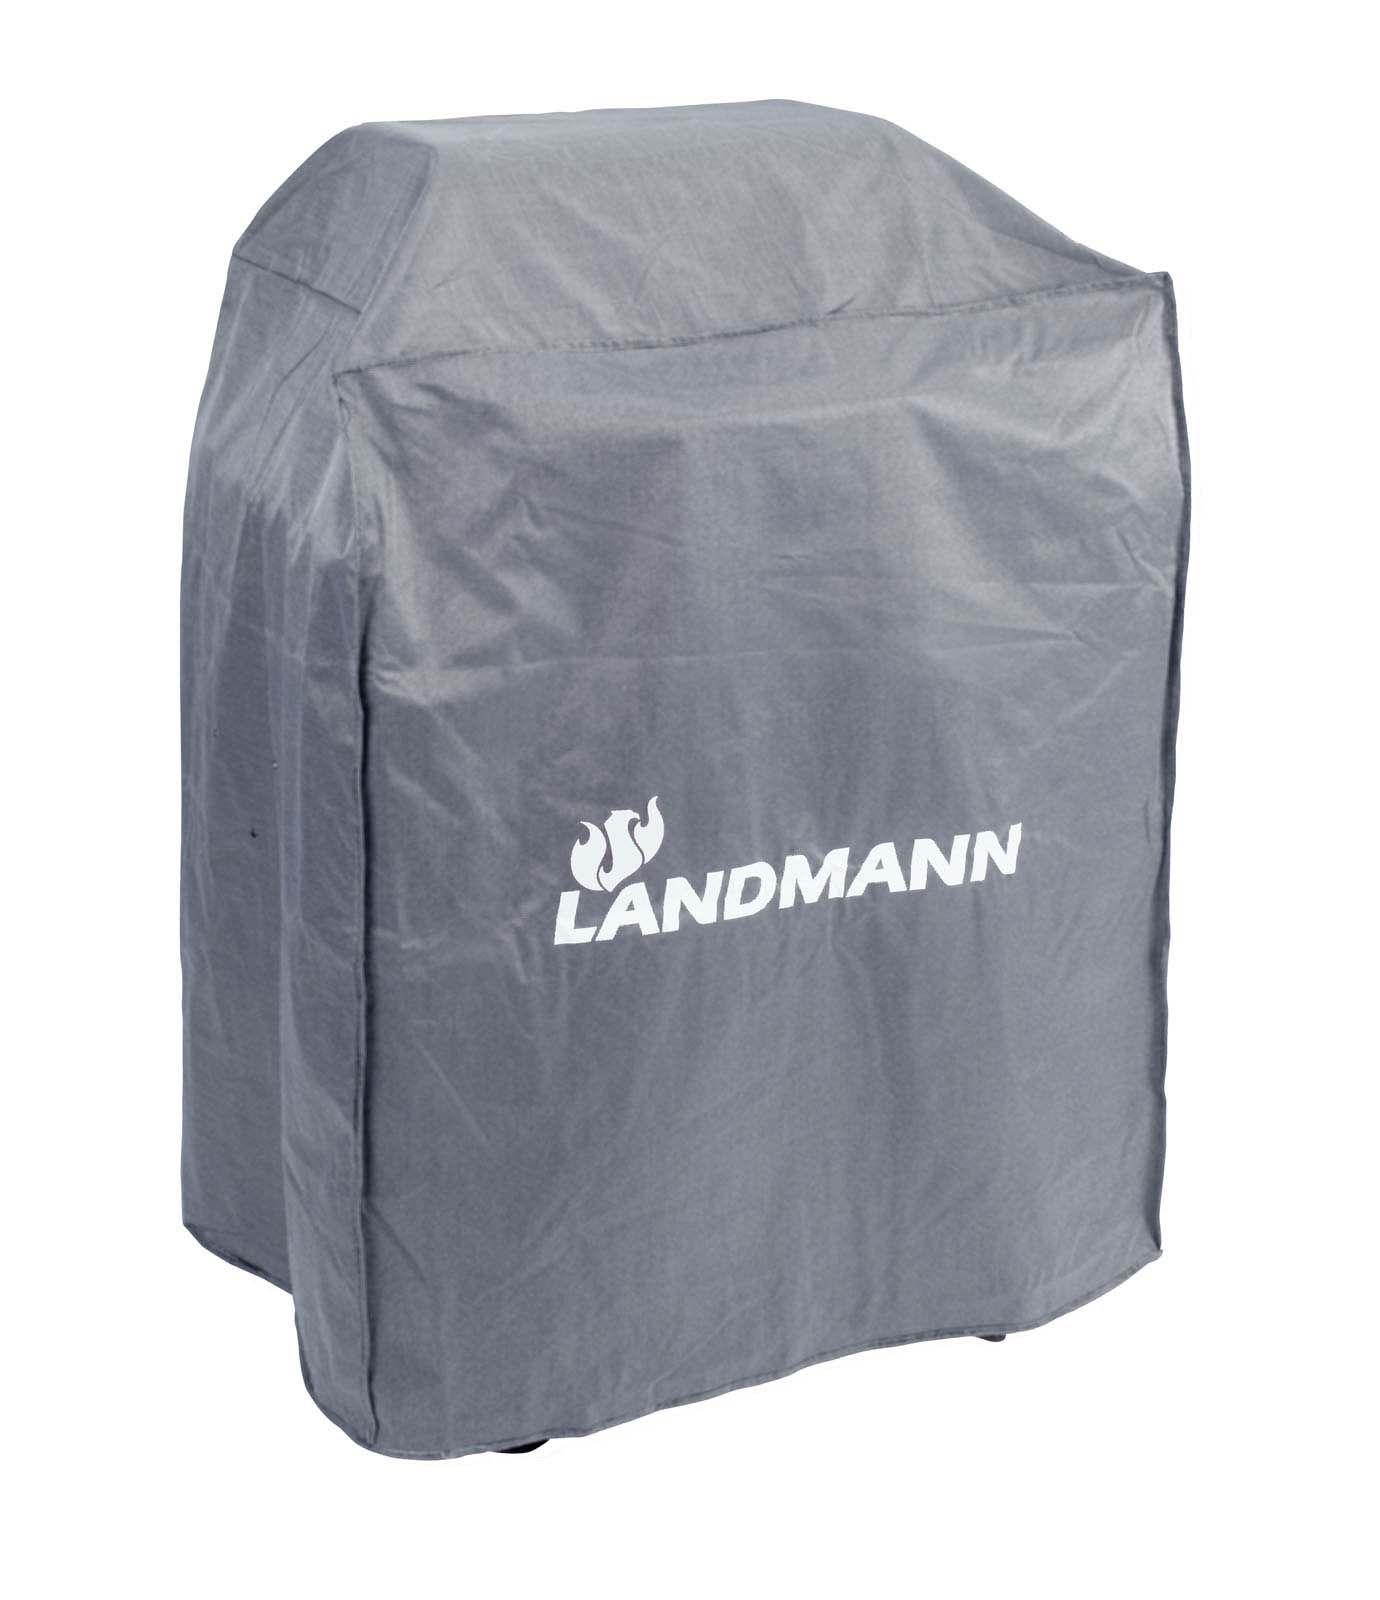 Landmann Premium Triton 2.0 & Dorado BBQ Cover